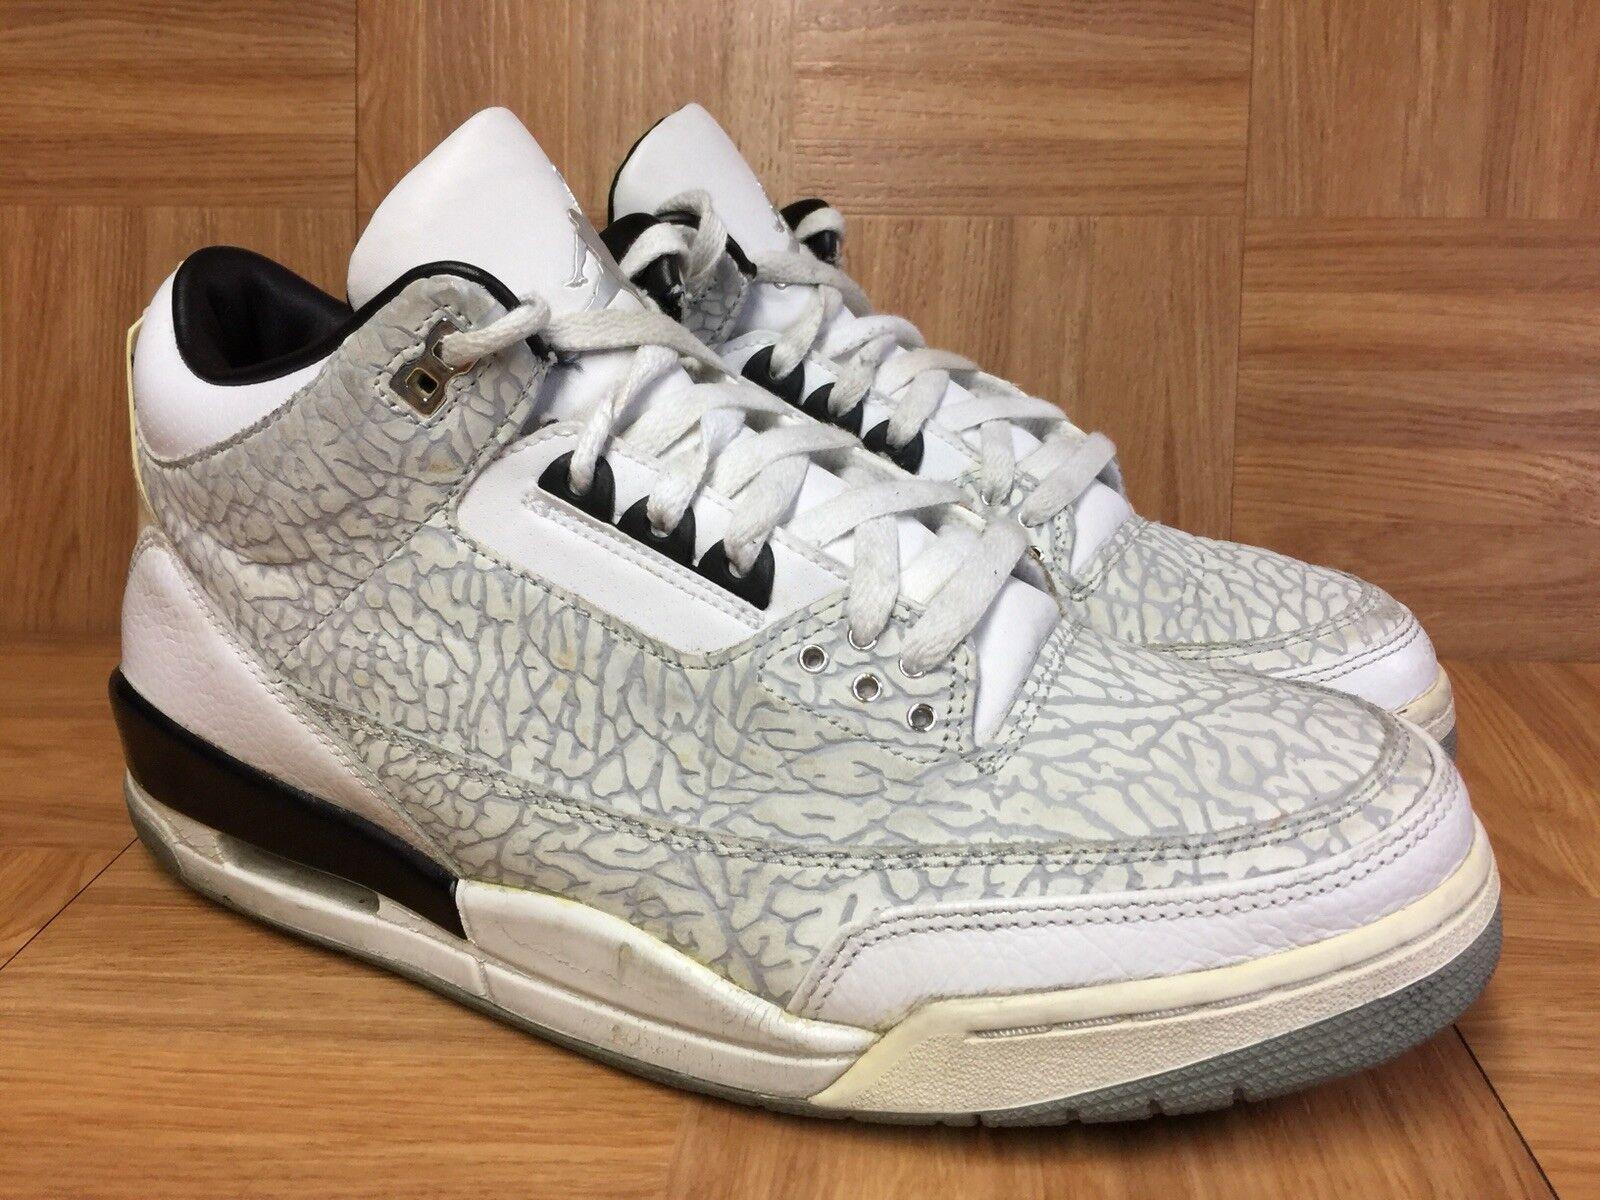 efc1090580659b Vintage Nike Air Jordan 3 III III III Flip Retro Silver Sz 12 Men s shoes  315767